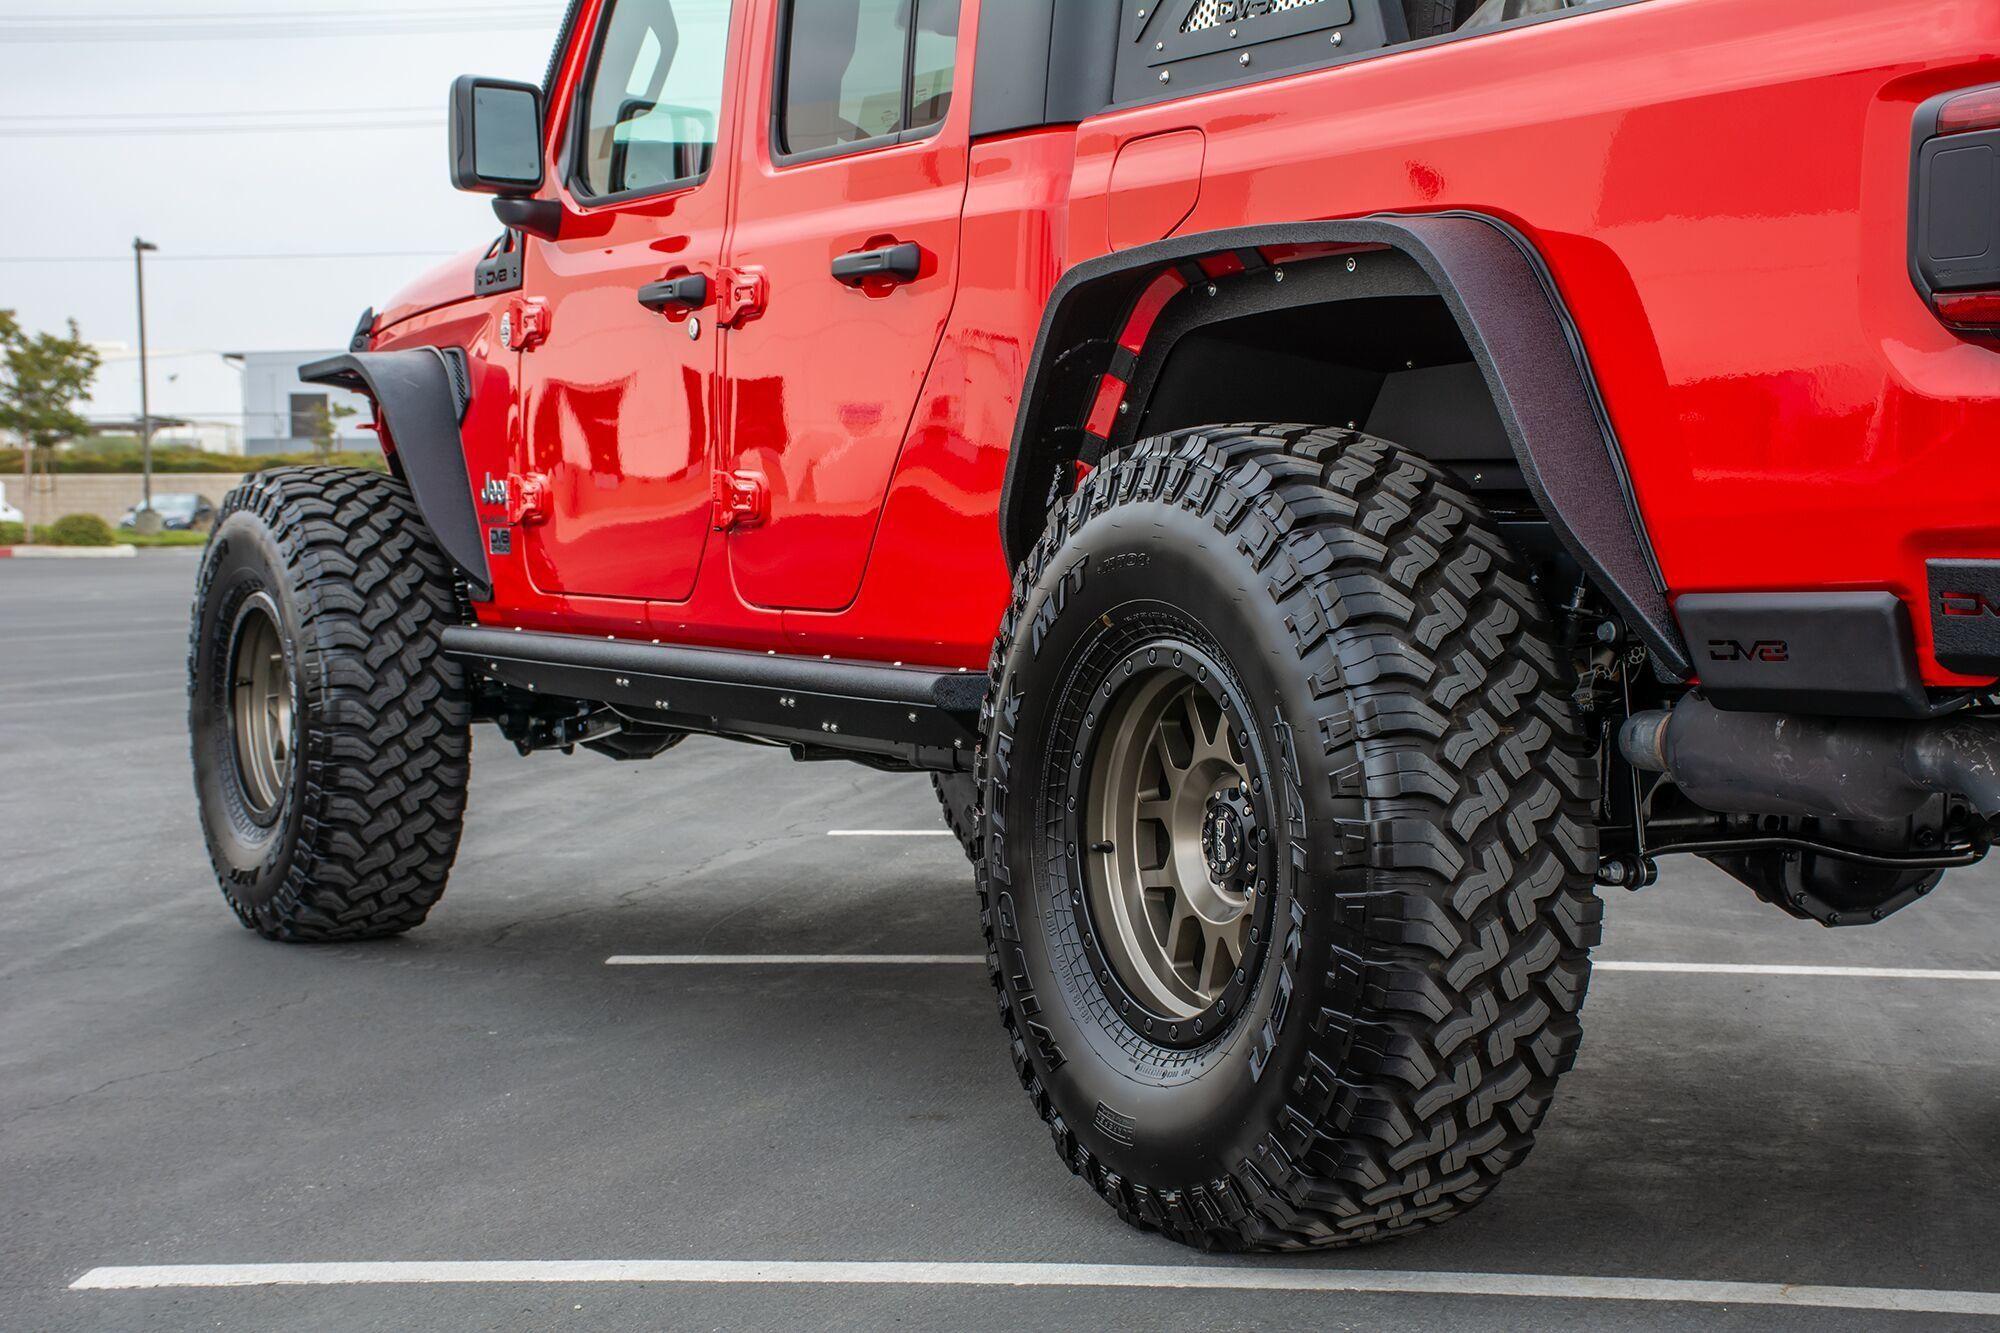 DV8 Offroad FDGL01 Armor Fenders for 2020 Jeep Gladiator